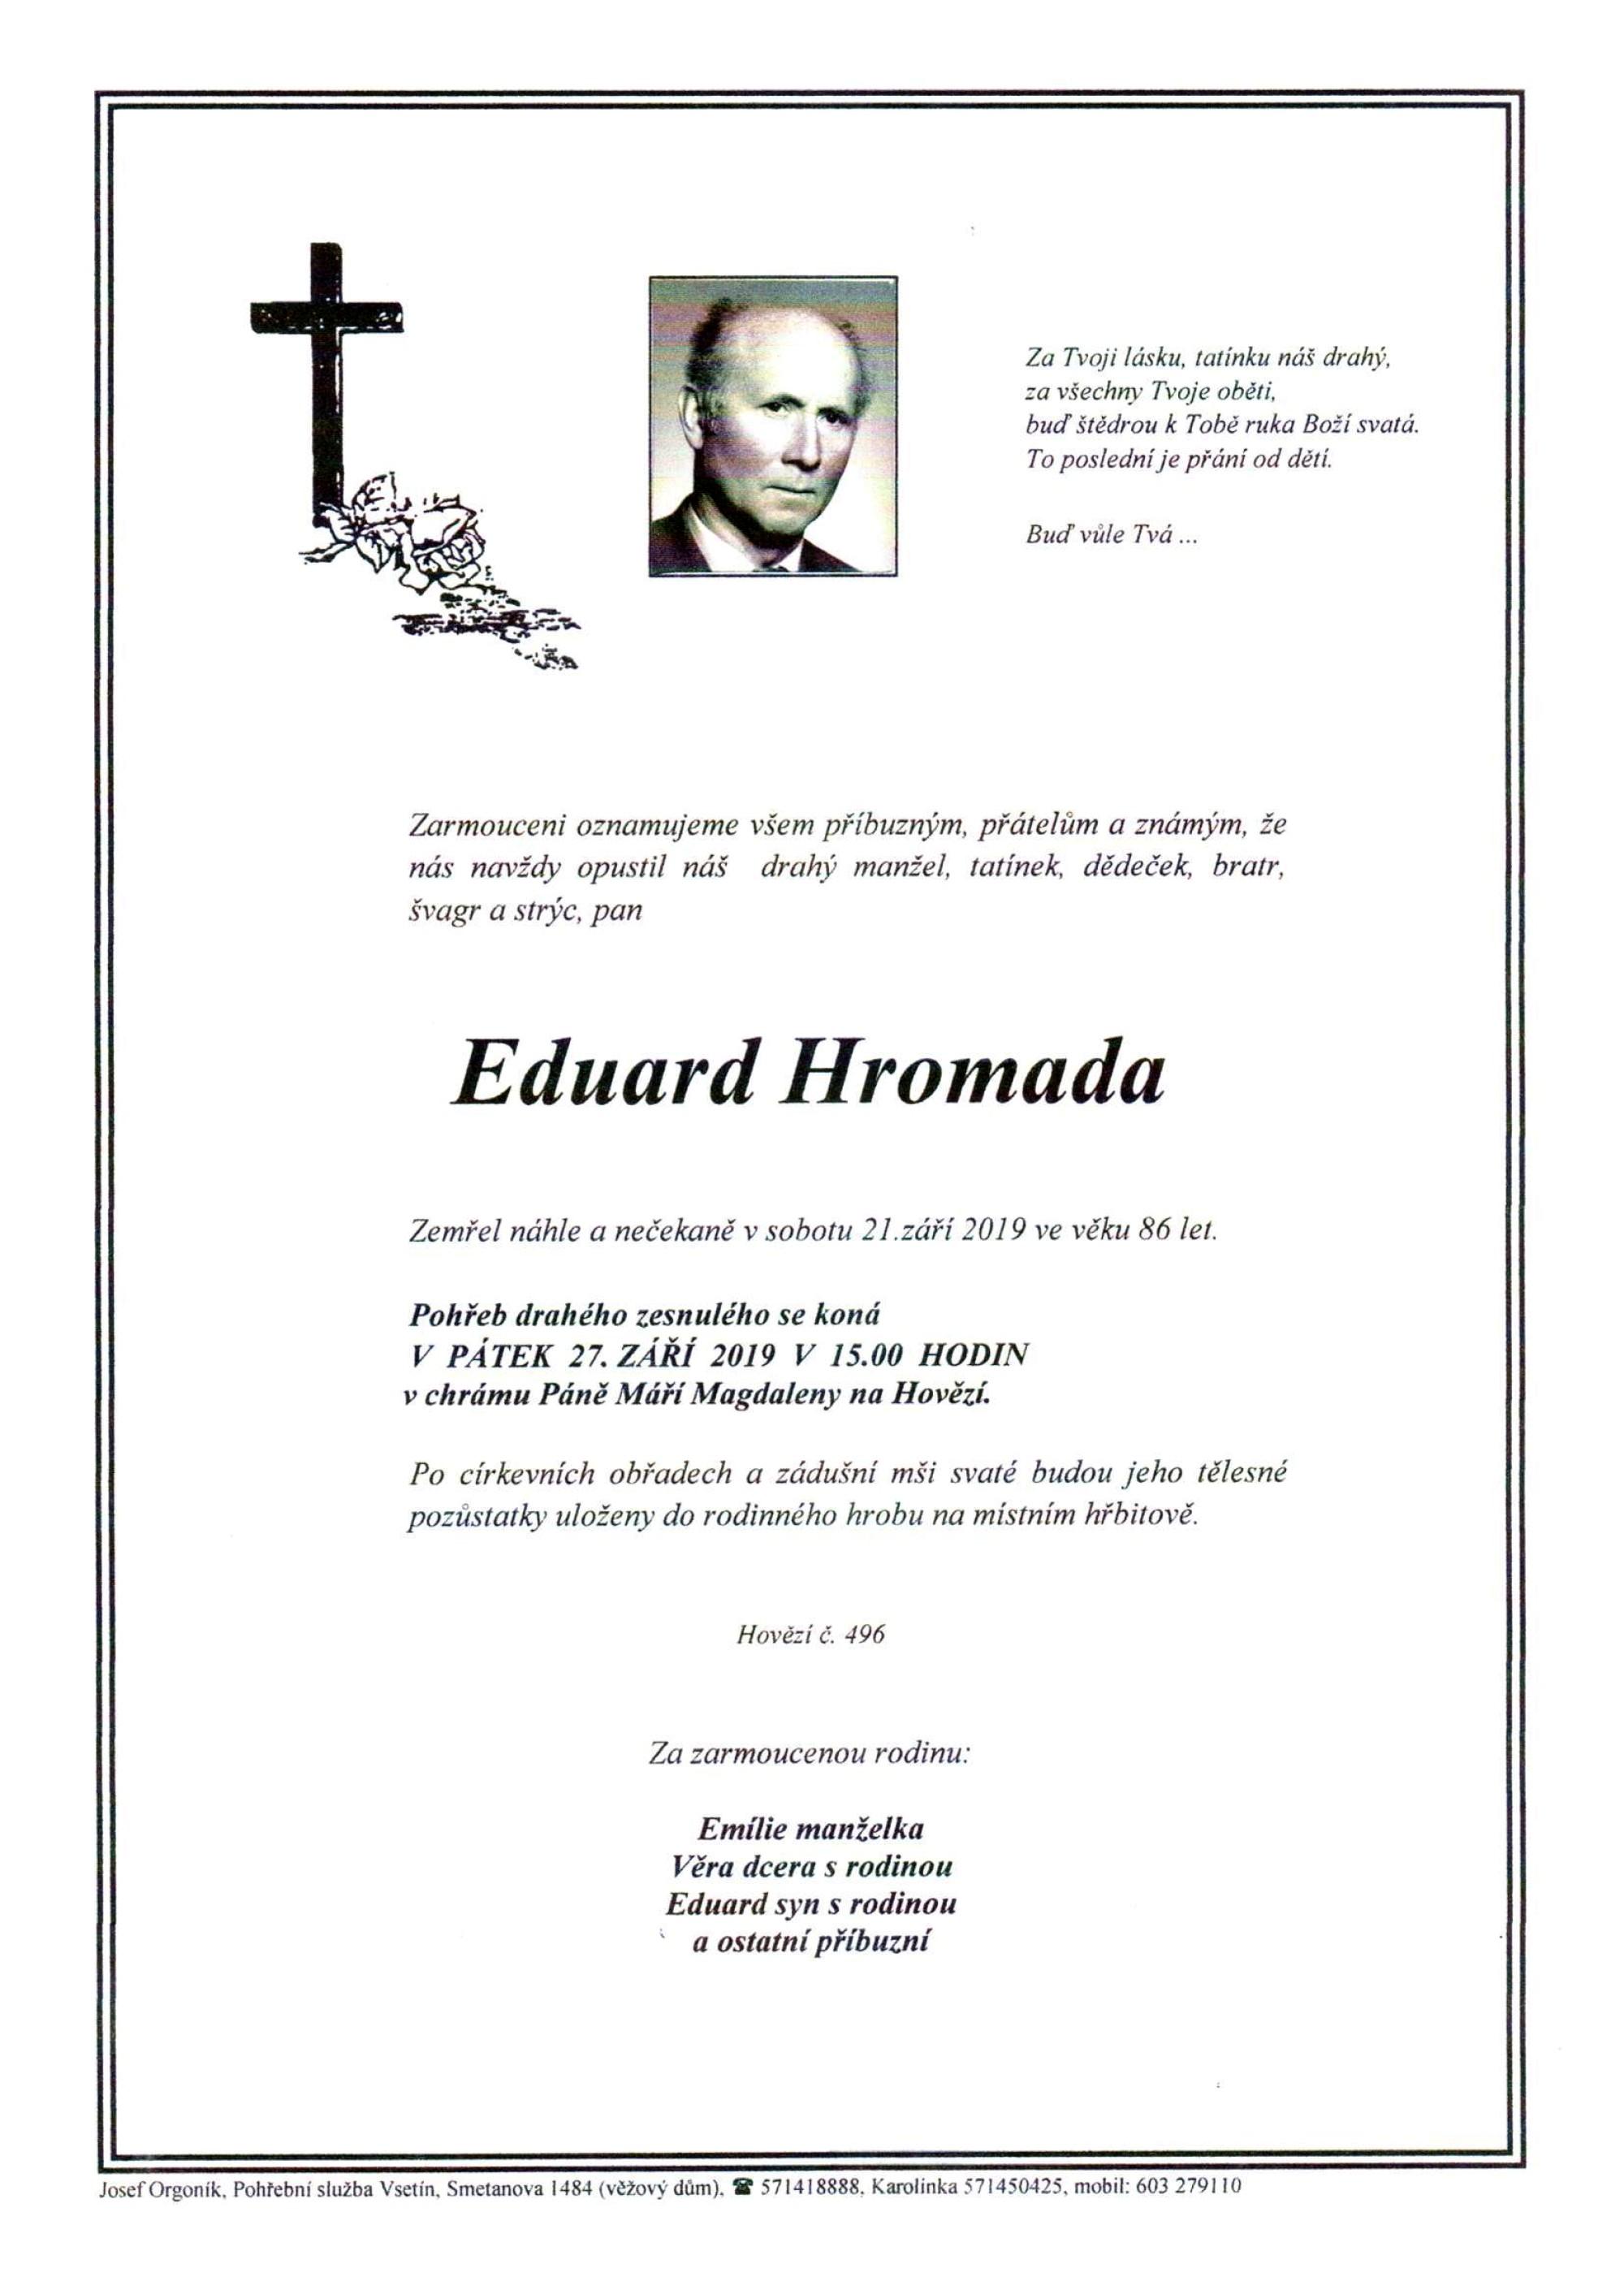 Eduard Hromada